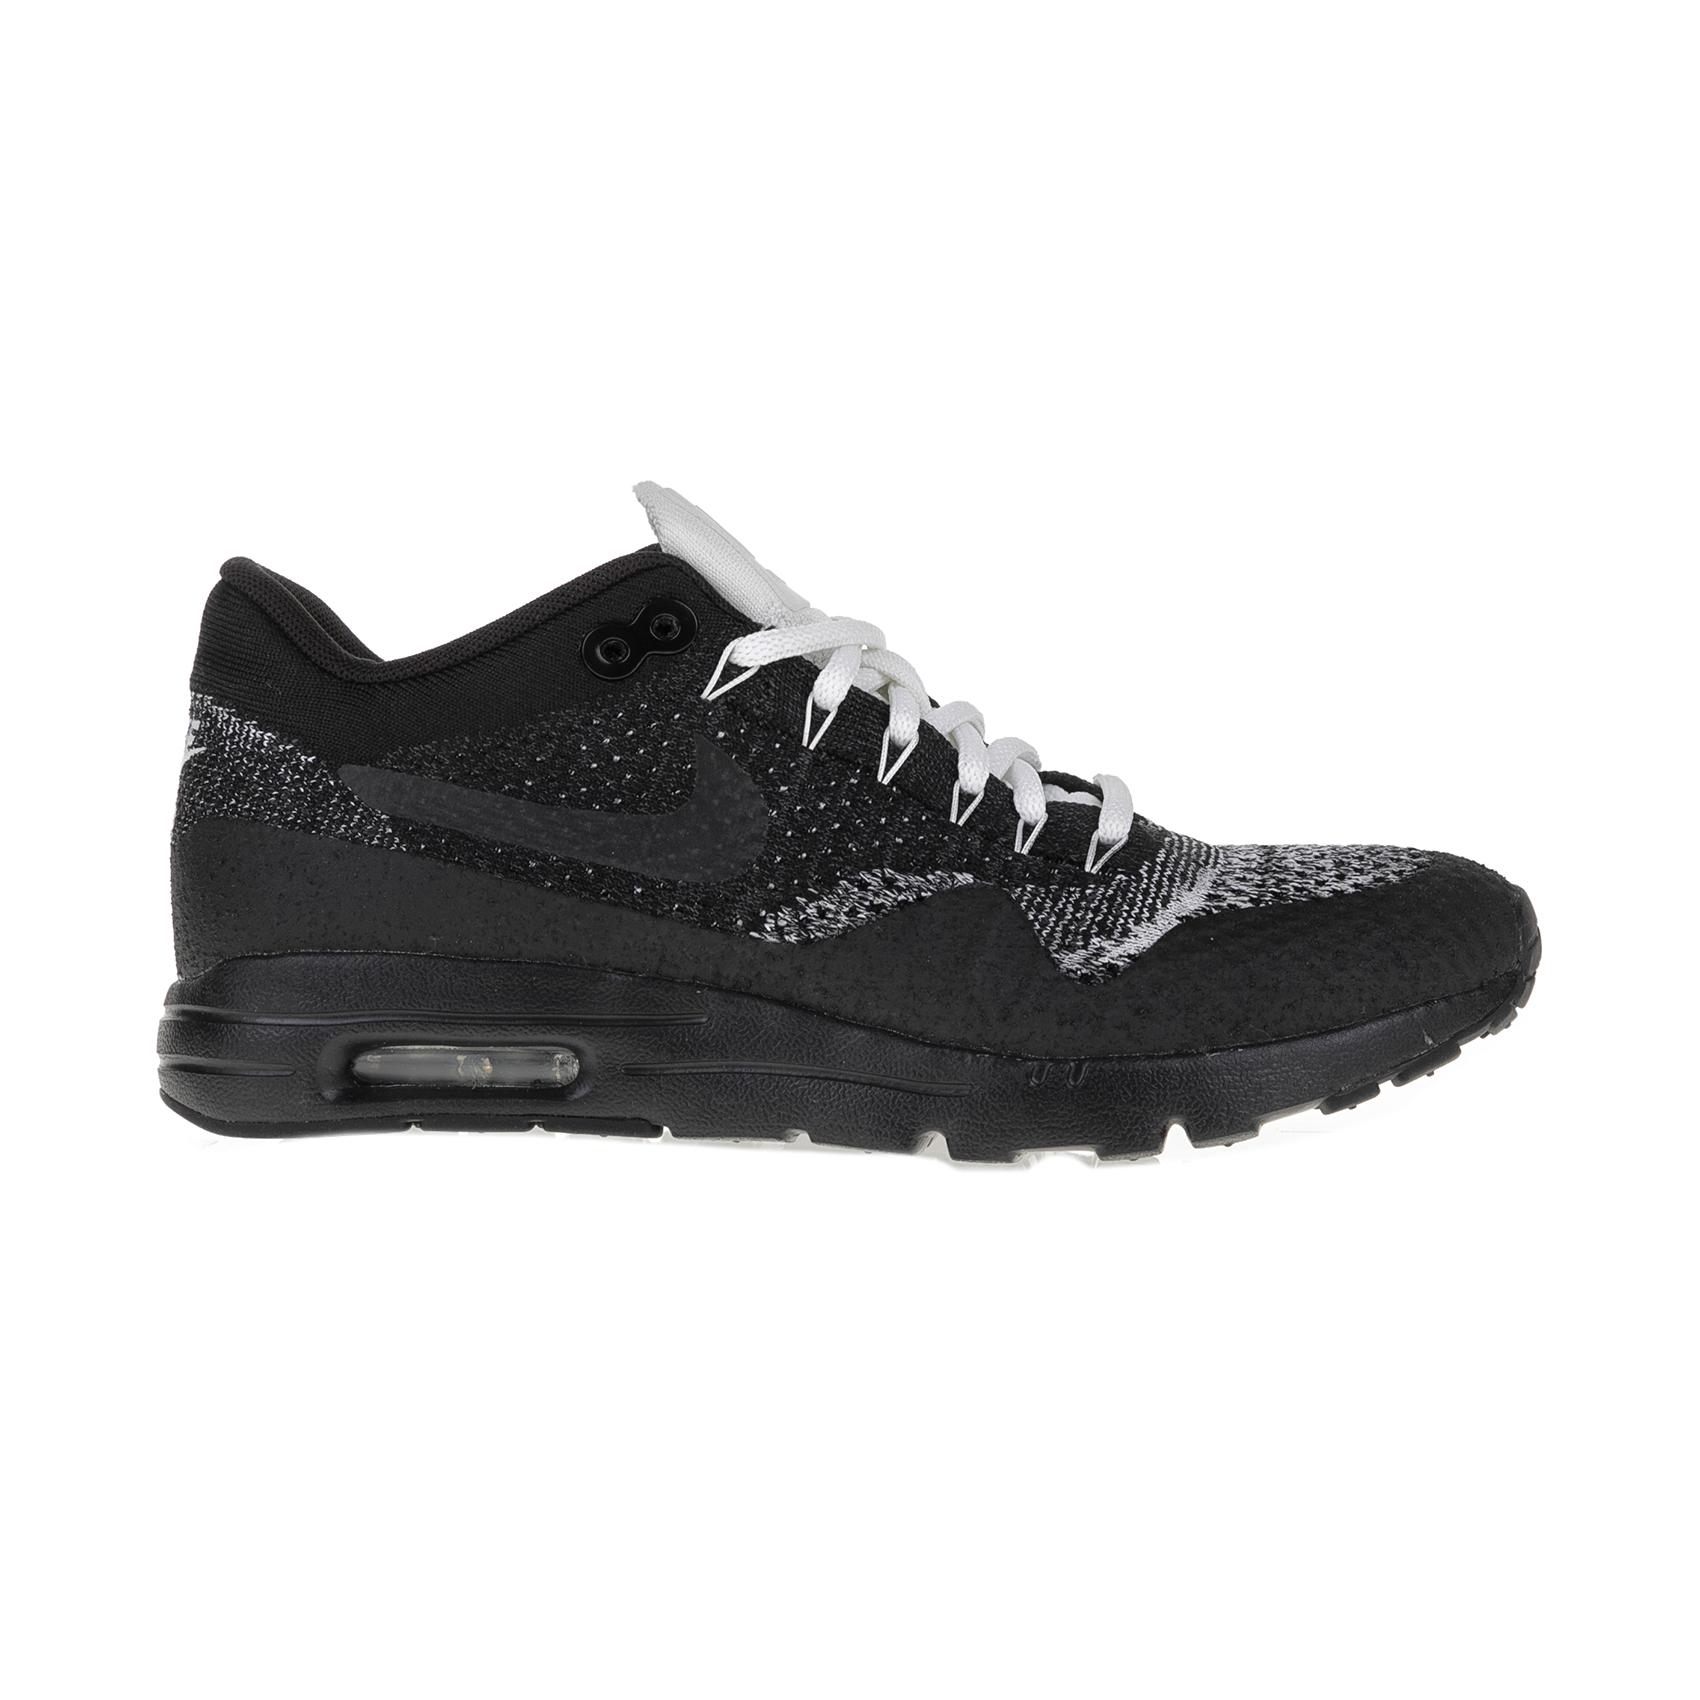 NIKE - Γυναικεία παπούτσια Nike AIR MAX 1 ULTRA FLYKNIT μαύρα γυναικεία παπούτσια αθλητικά running